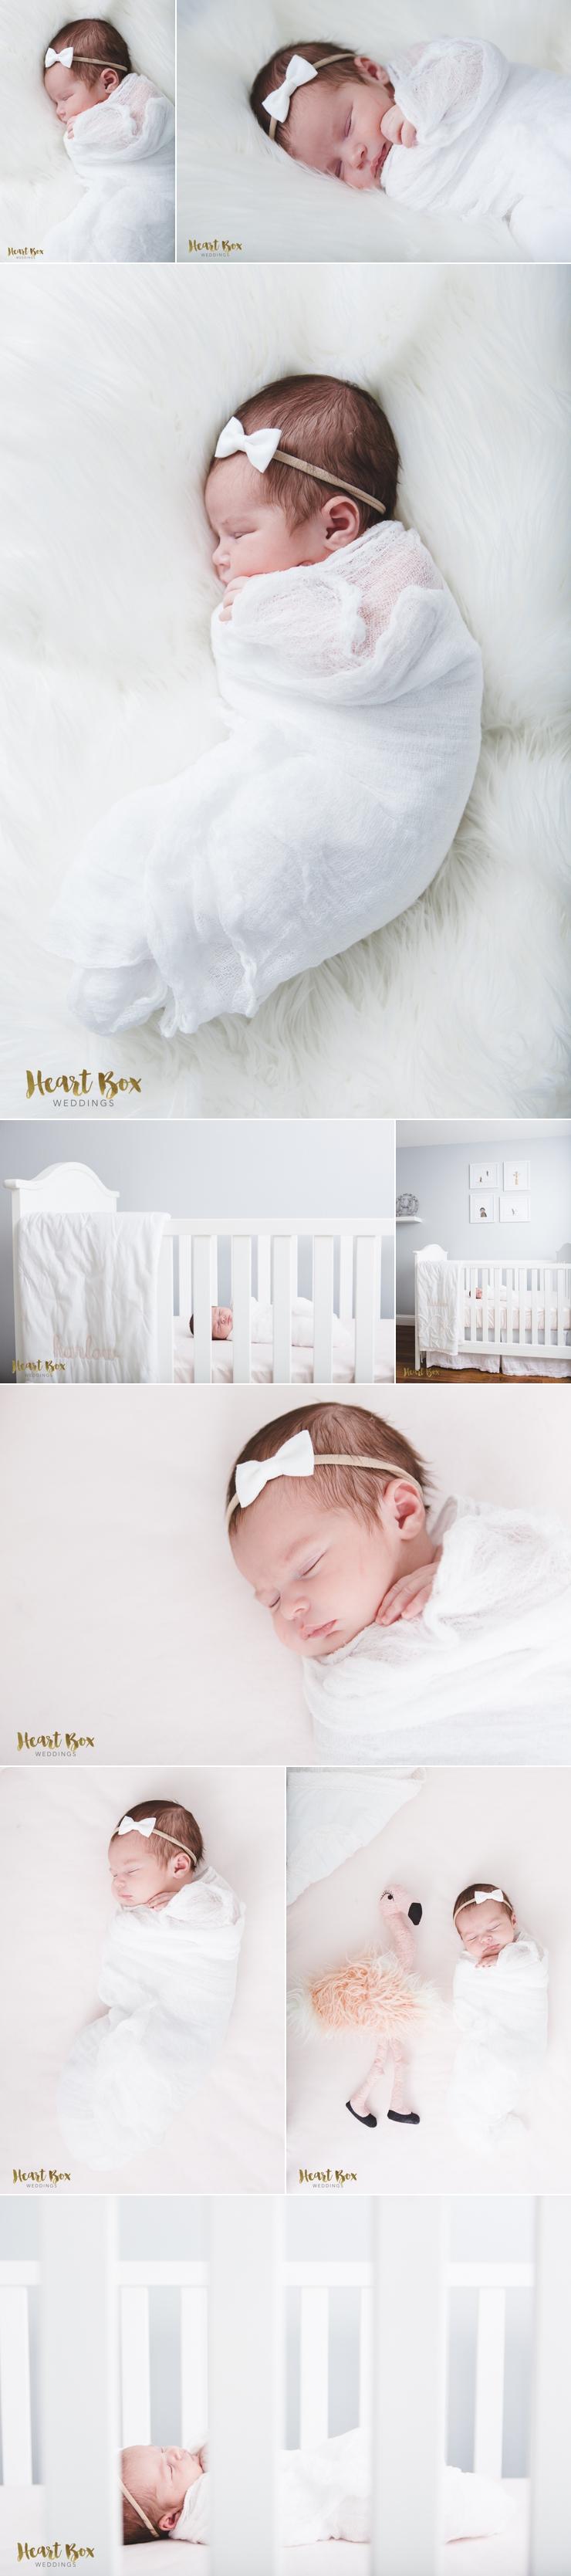 Harlow Newborn Blog Collages 3.jpg